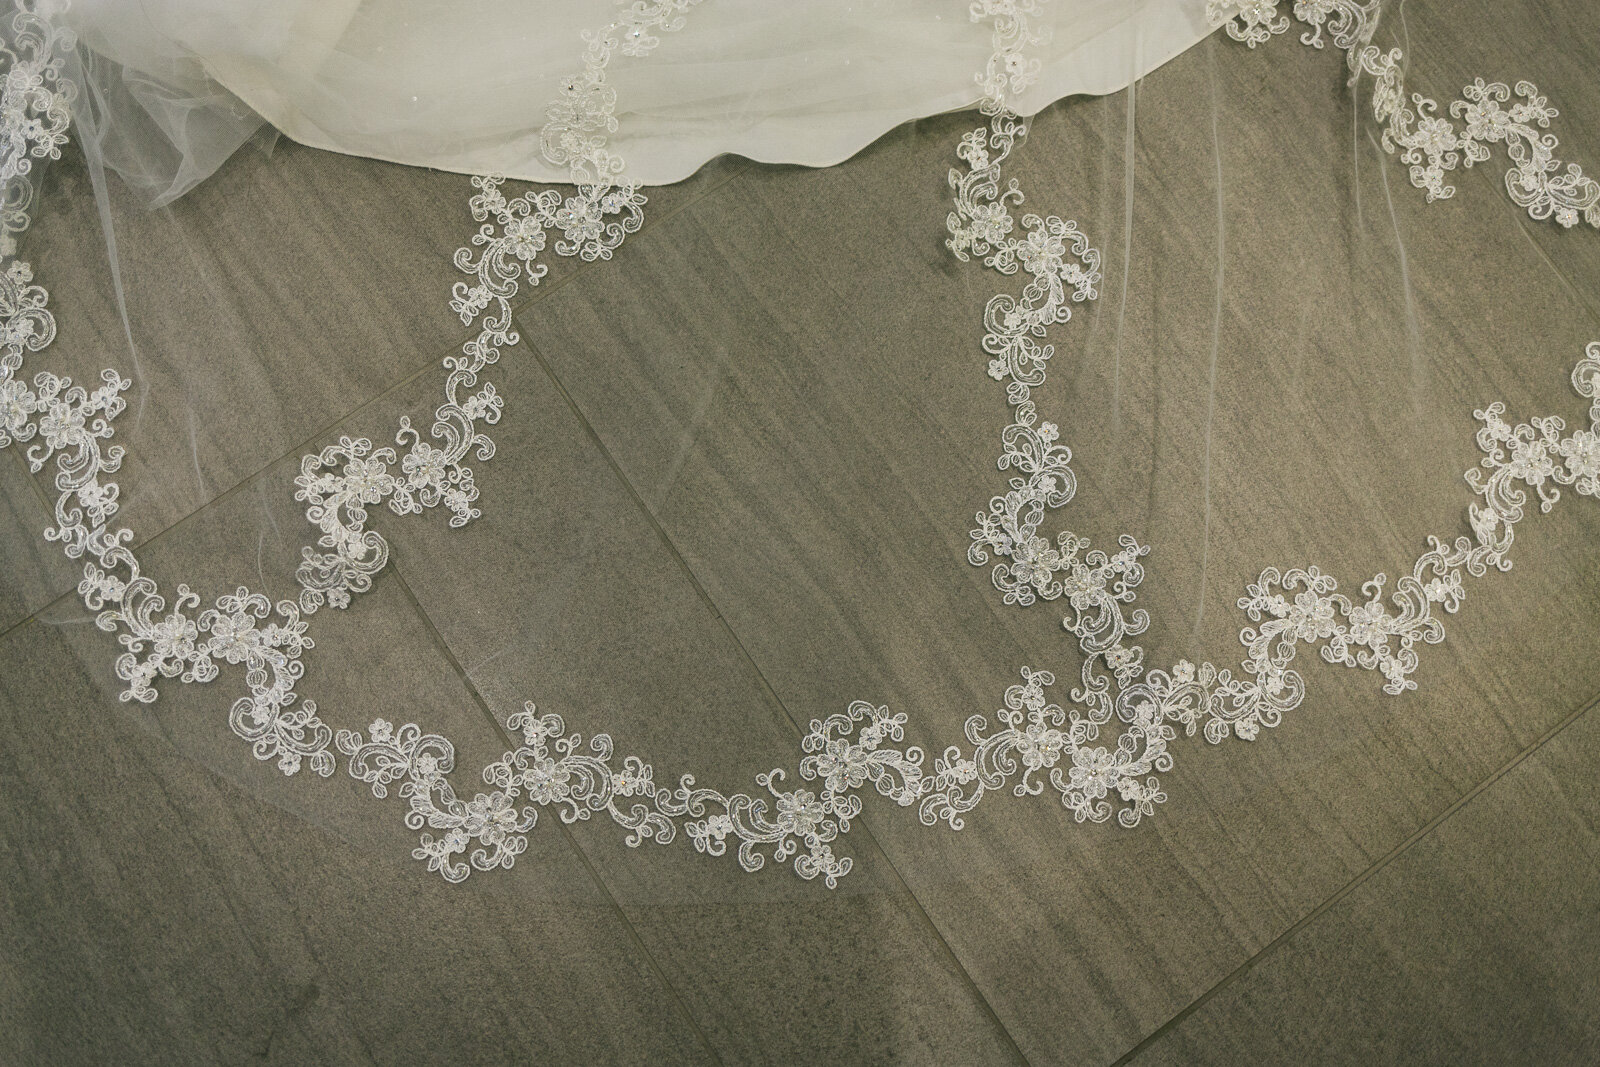 jessica-liam-wedding-blog-11.jpg